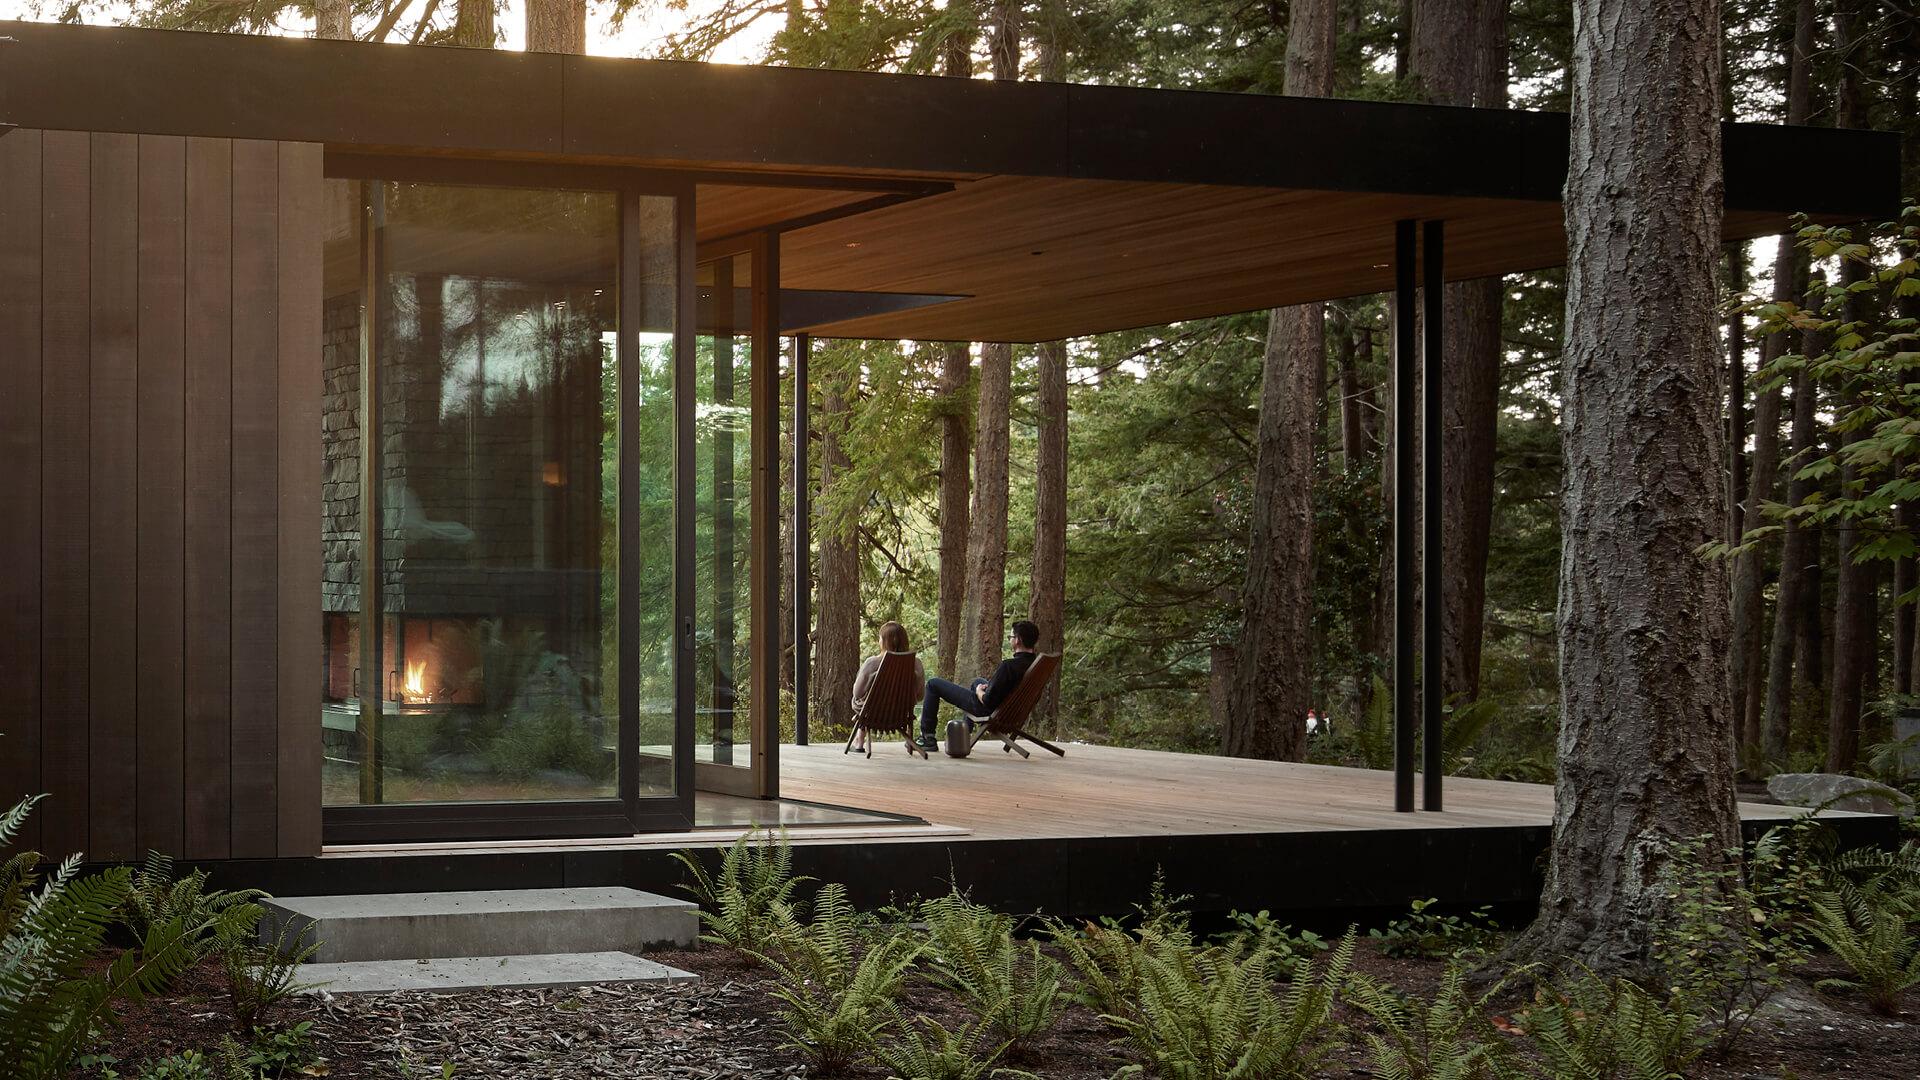 Whidbey Island Farm Retreat by Mwworks honours pastoral landscape in Washington